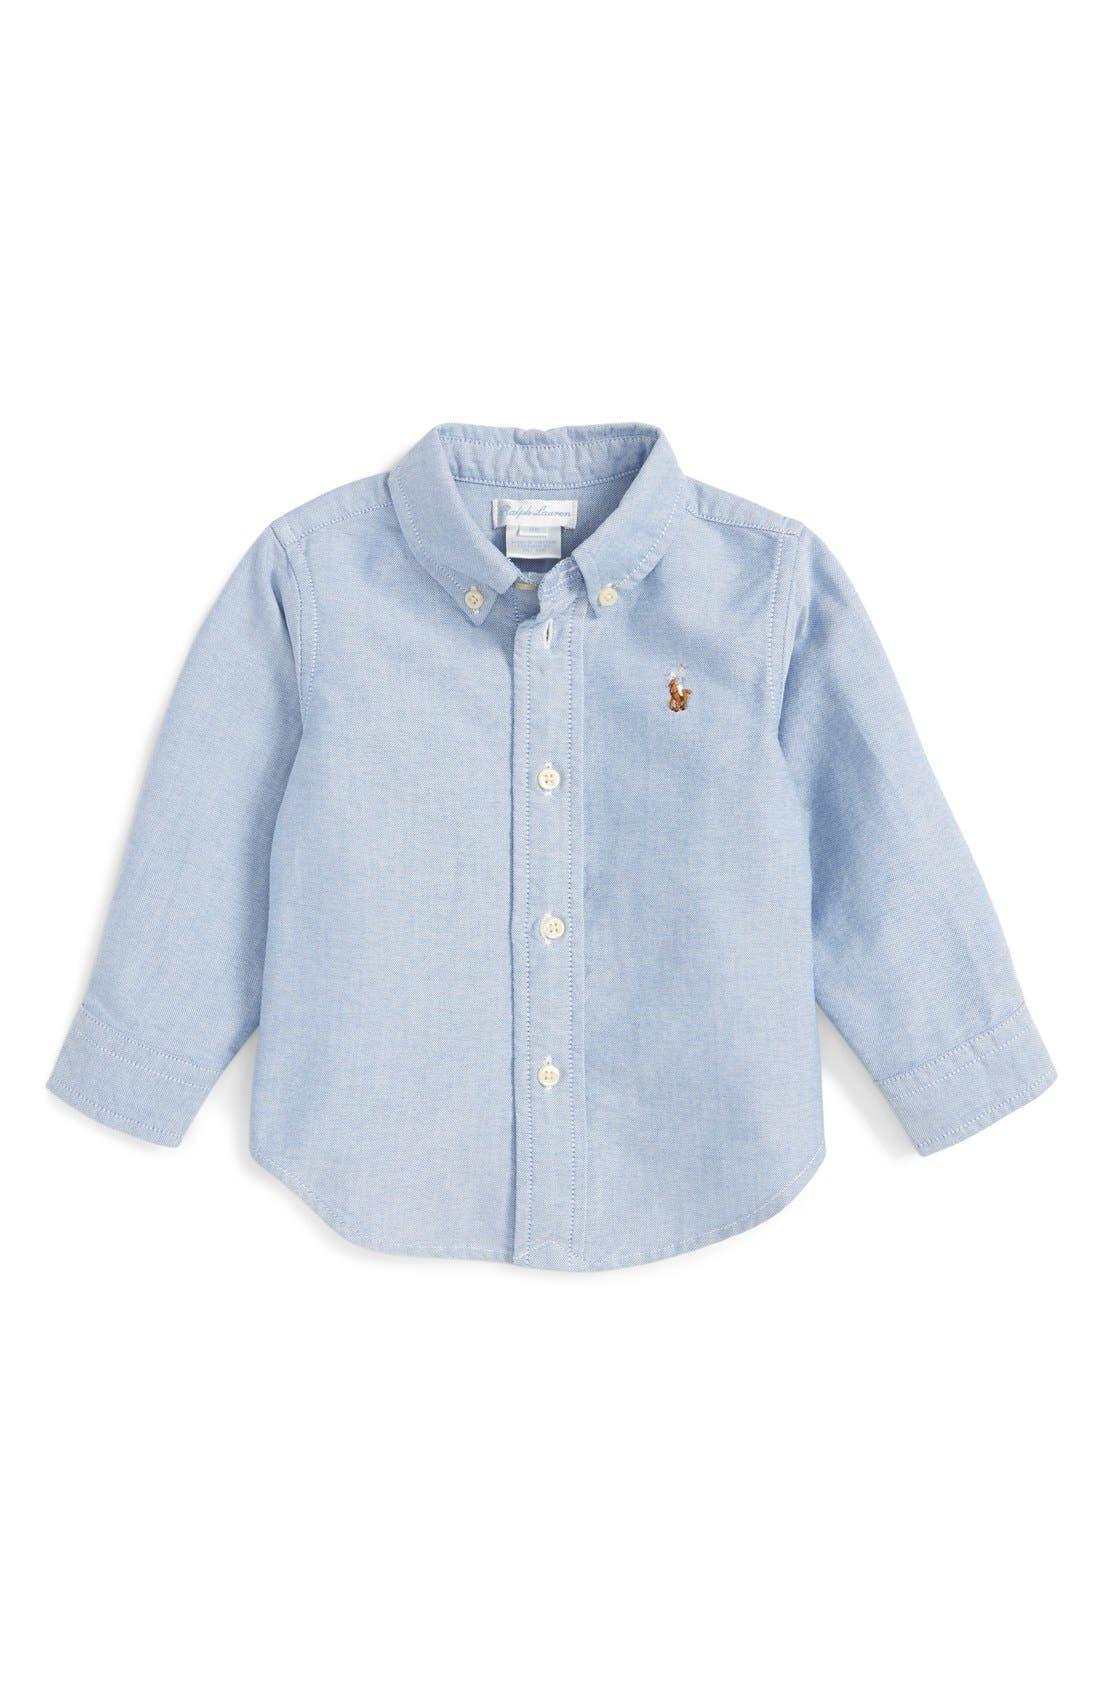 RALPH LAUREN, Oxford Shirt, Main thumbnail 1, color, 450